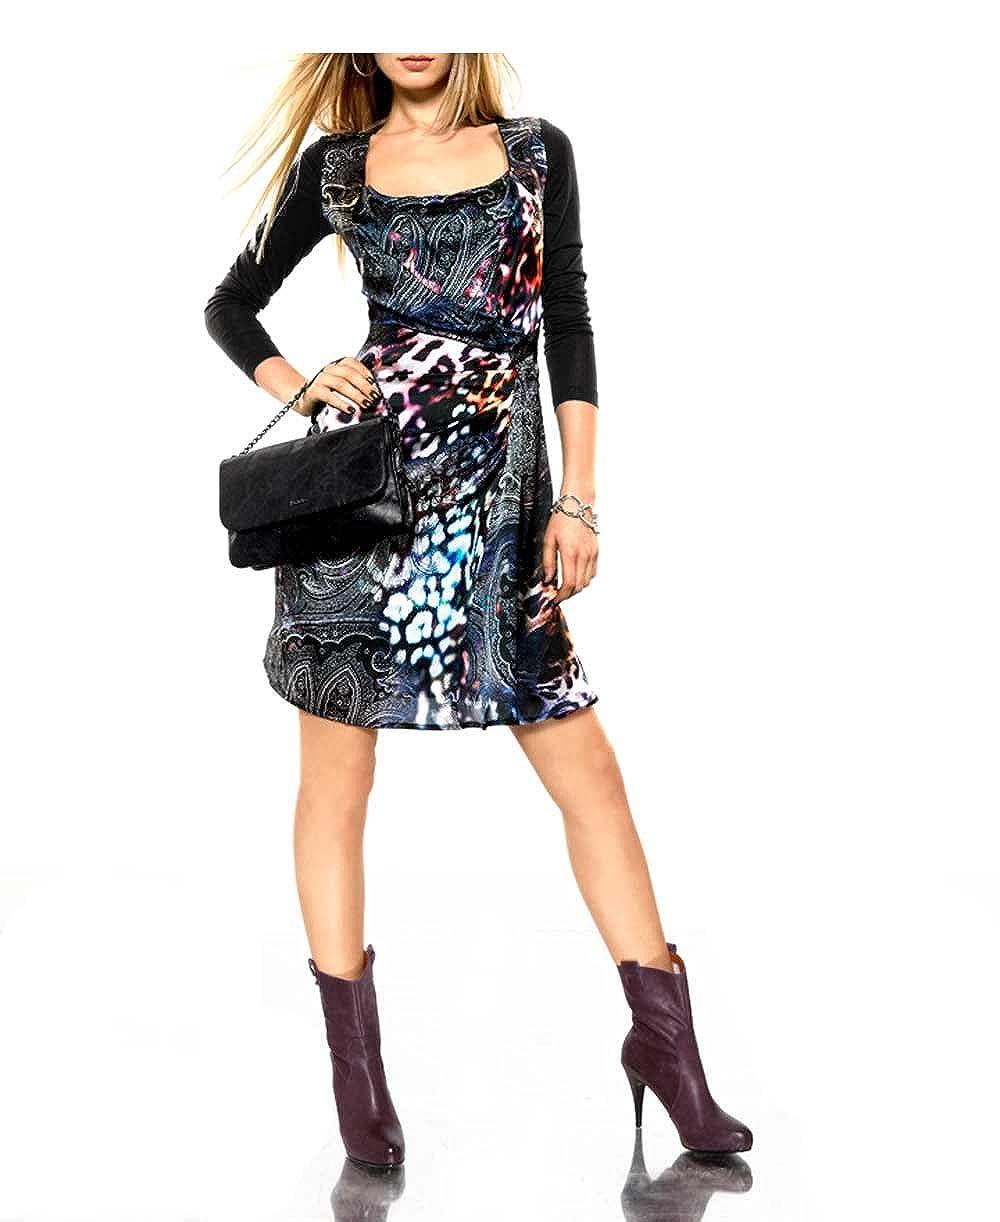 PATRIZIA DINI Damen-Kleid Seidenkleid Mehrfarbig Größe 44